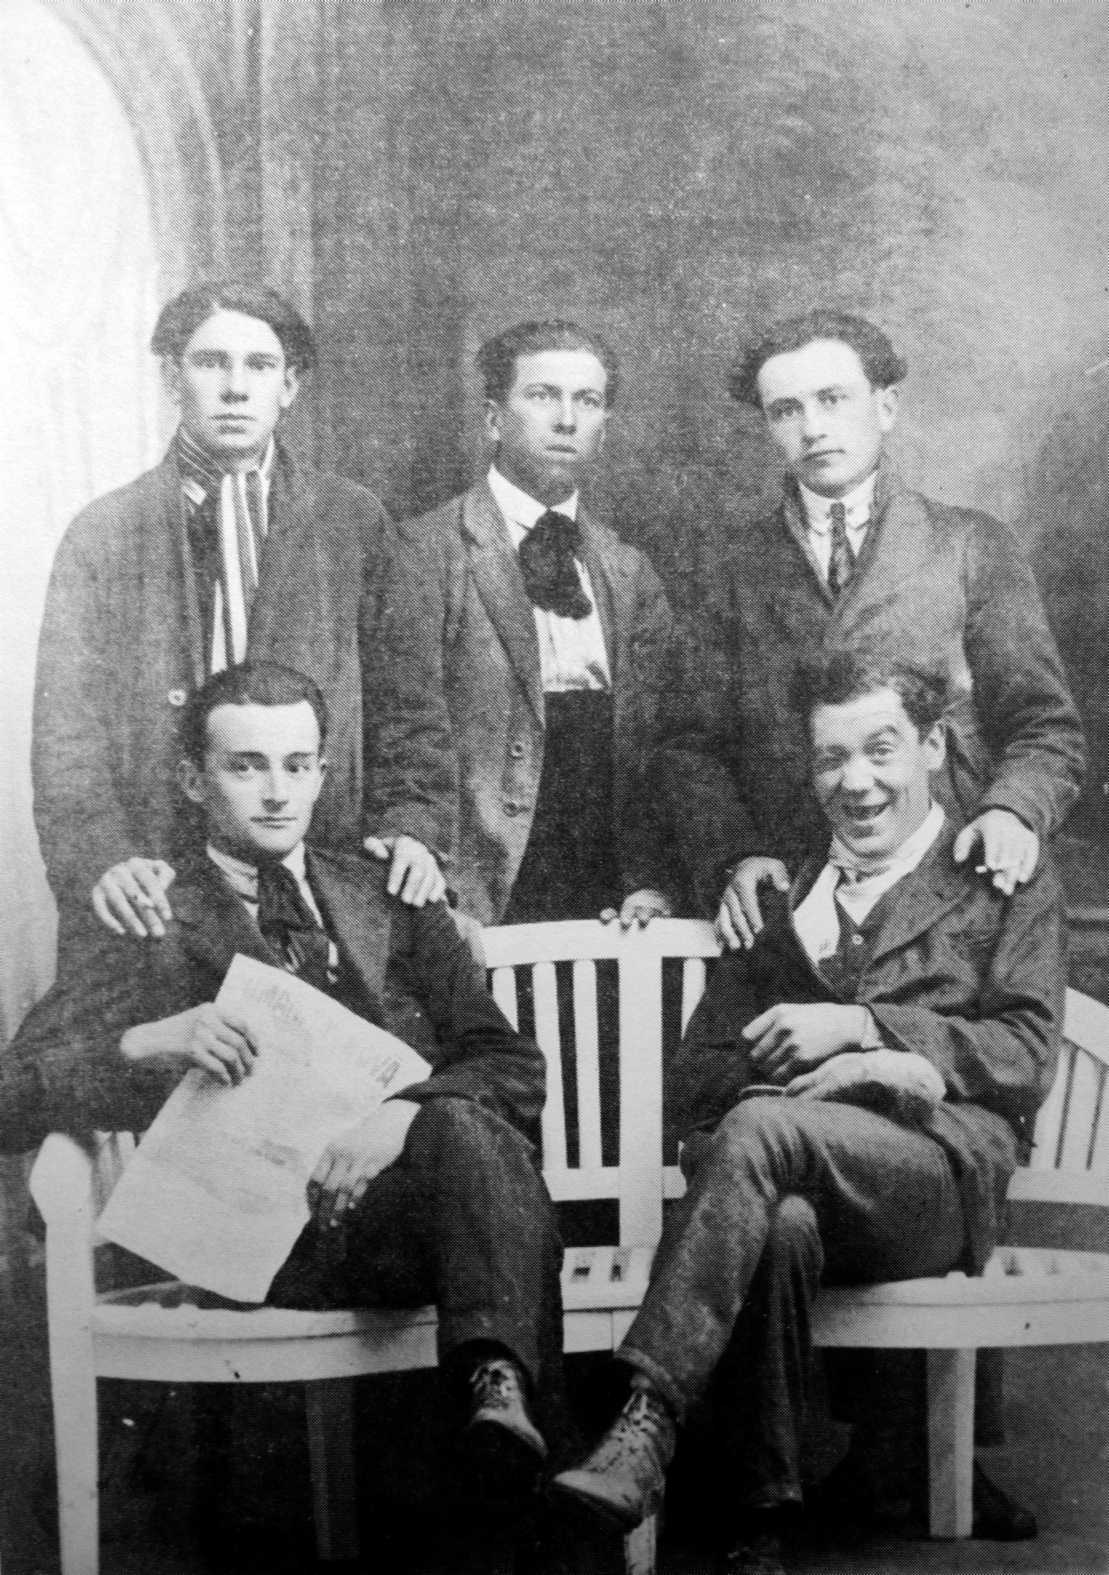 Joves anarquistes. D'esquerra a dreta: Rivoluzio Gilioli, Renzo Cepelli, ?; (asseguts) Luigi Evangelista i Antonio Gramantieri (Mòdena, començaments de 1920)